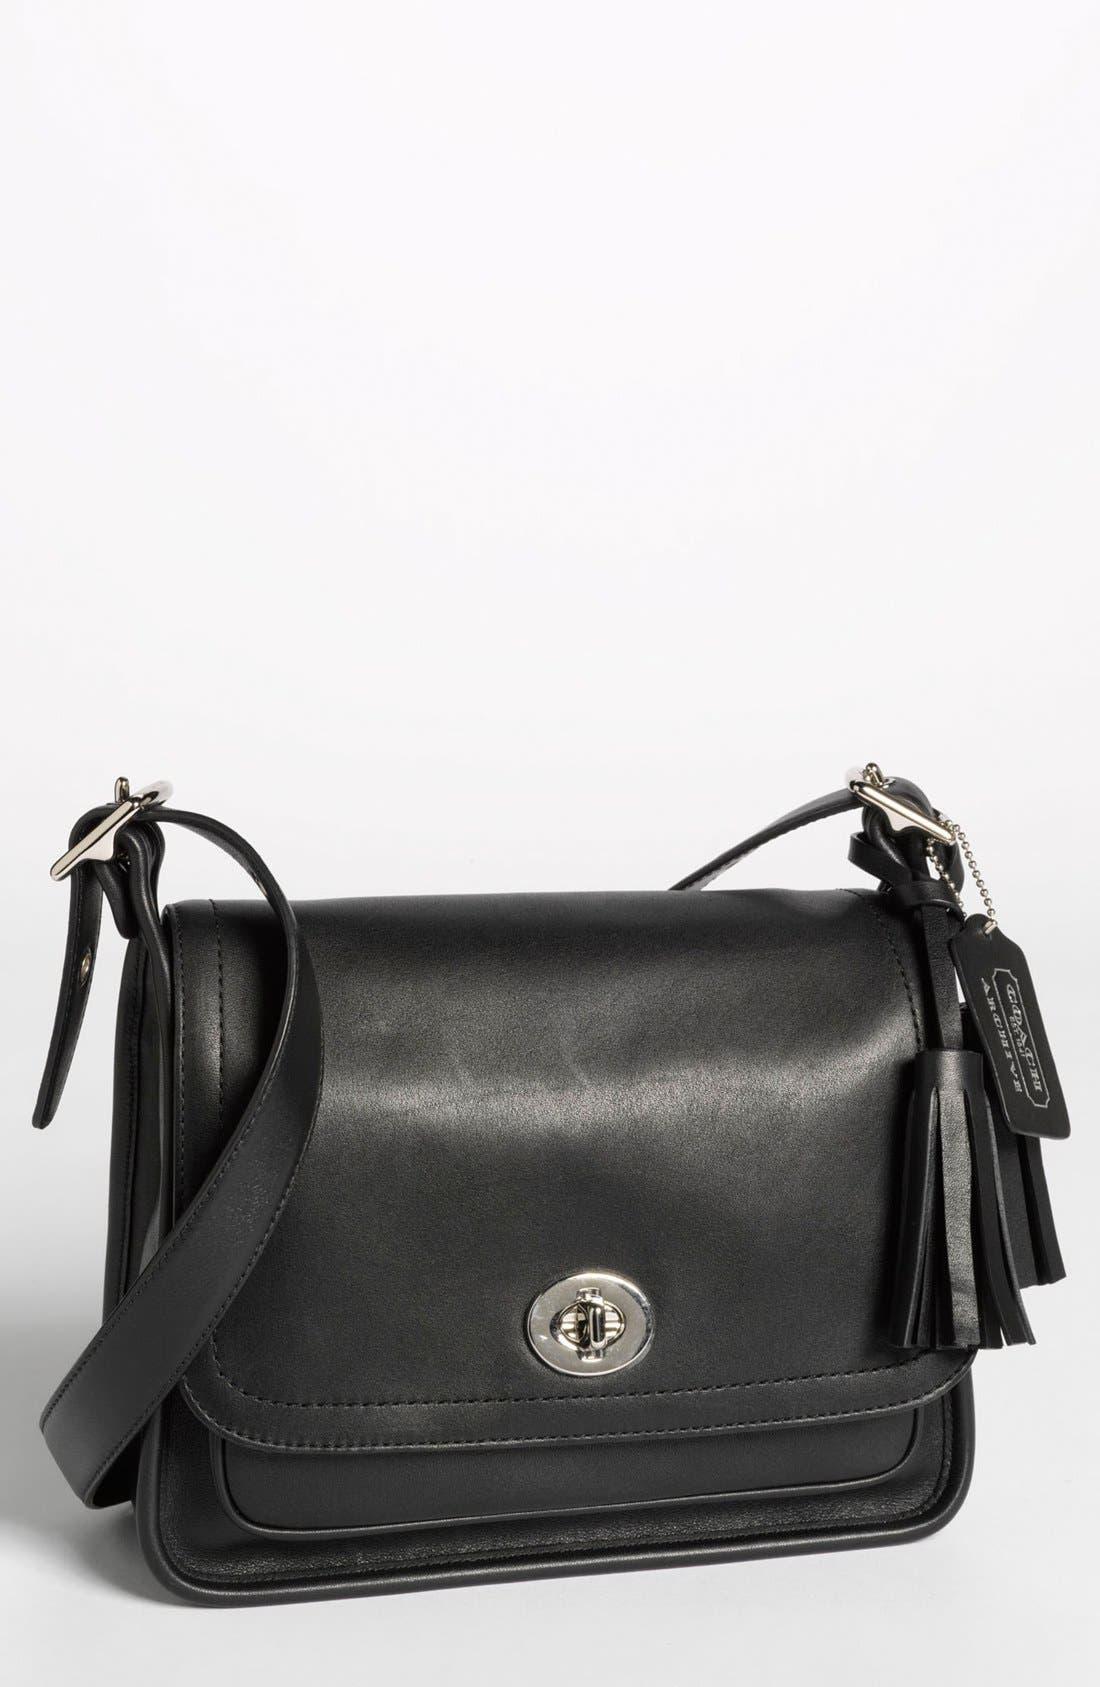 Main Image - COACH 'Legacy Archival Rambler' Leather Crossbody Bag, Small